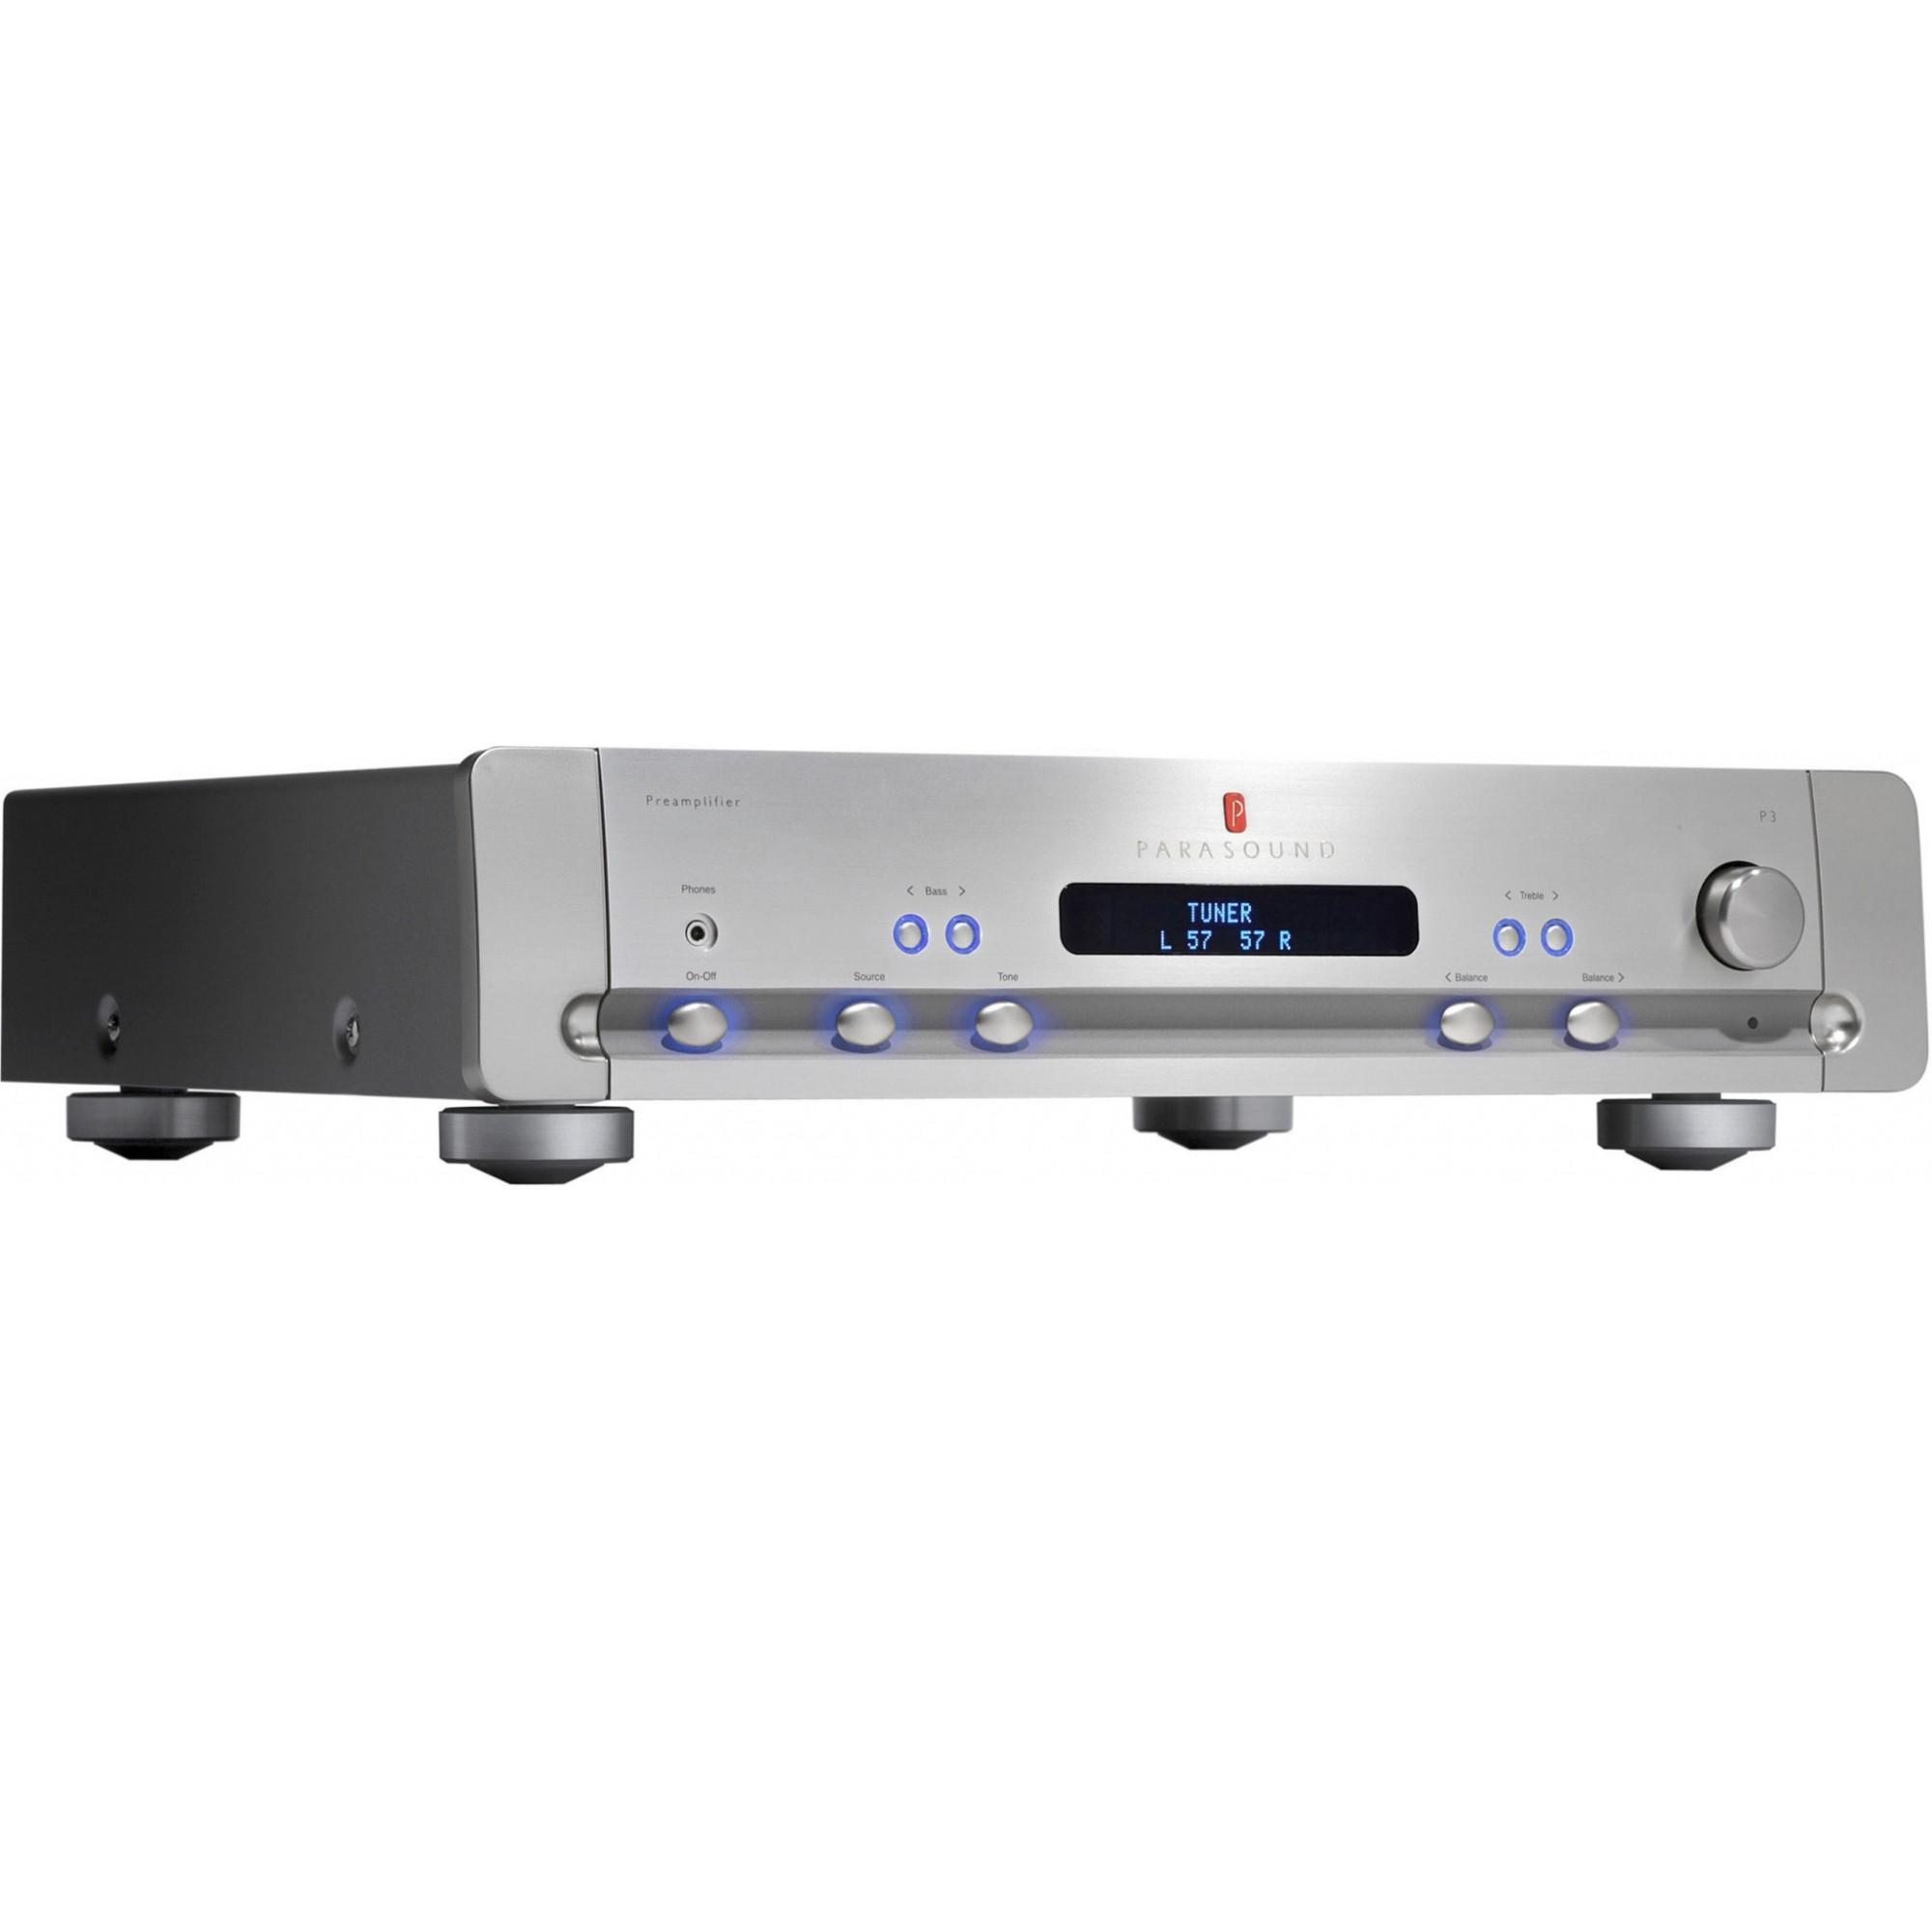 Parasound Halo P3 Pré-amplificador - Prata